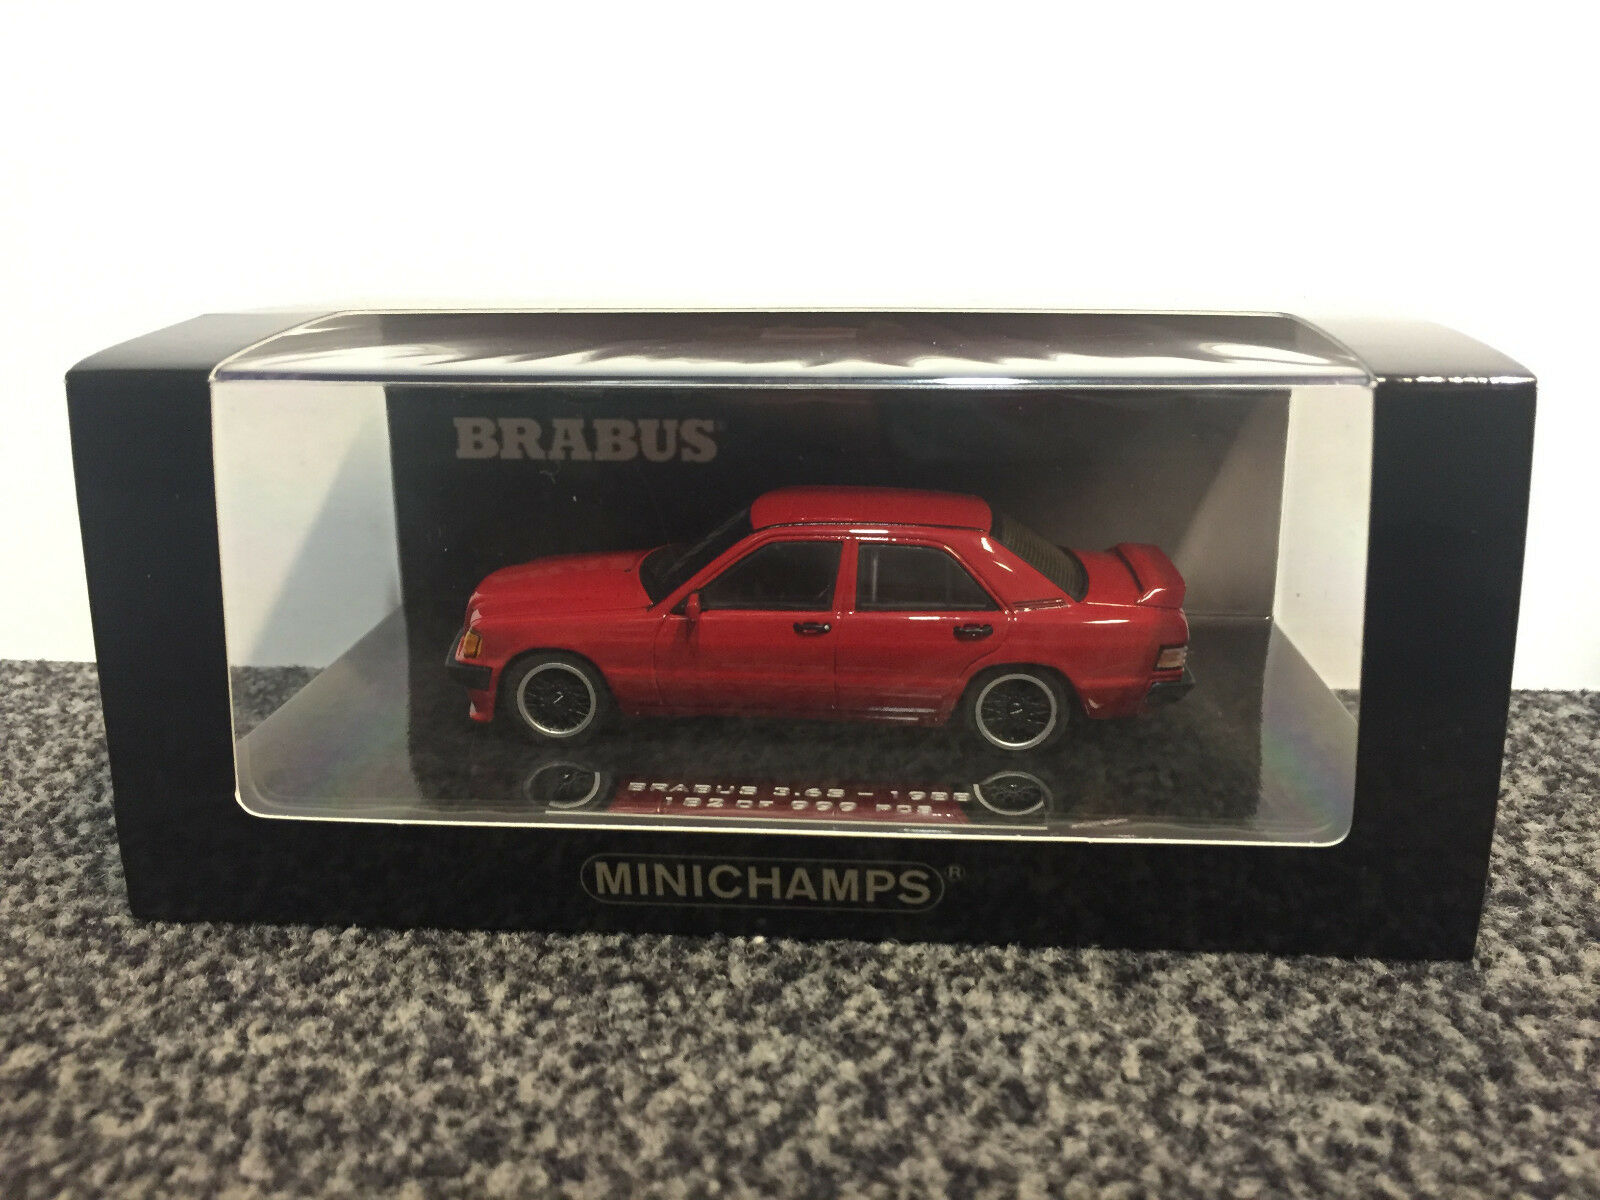 Brabus 3.6s 1988 (190e w201) rouge (nº 182) 1 43 MINICHAMPS